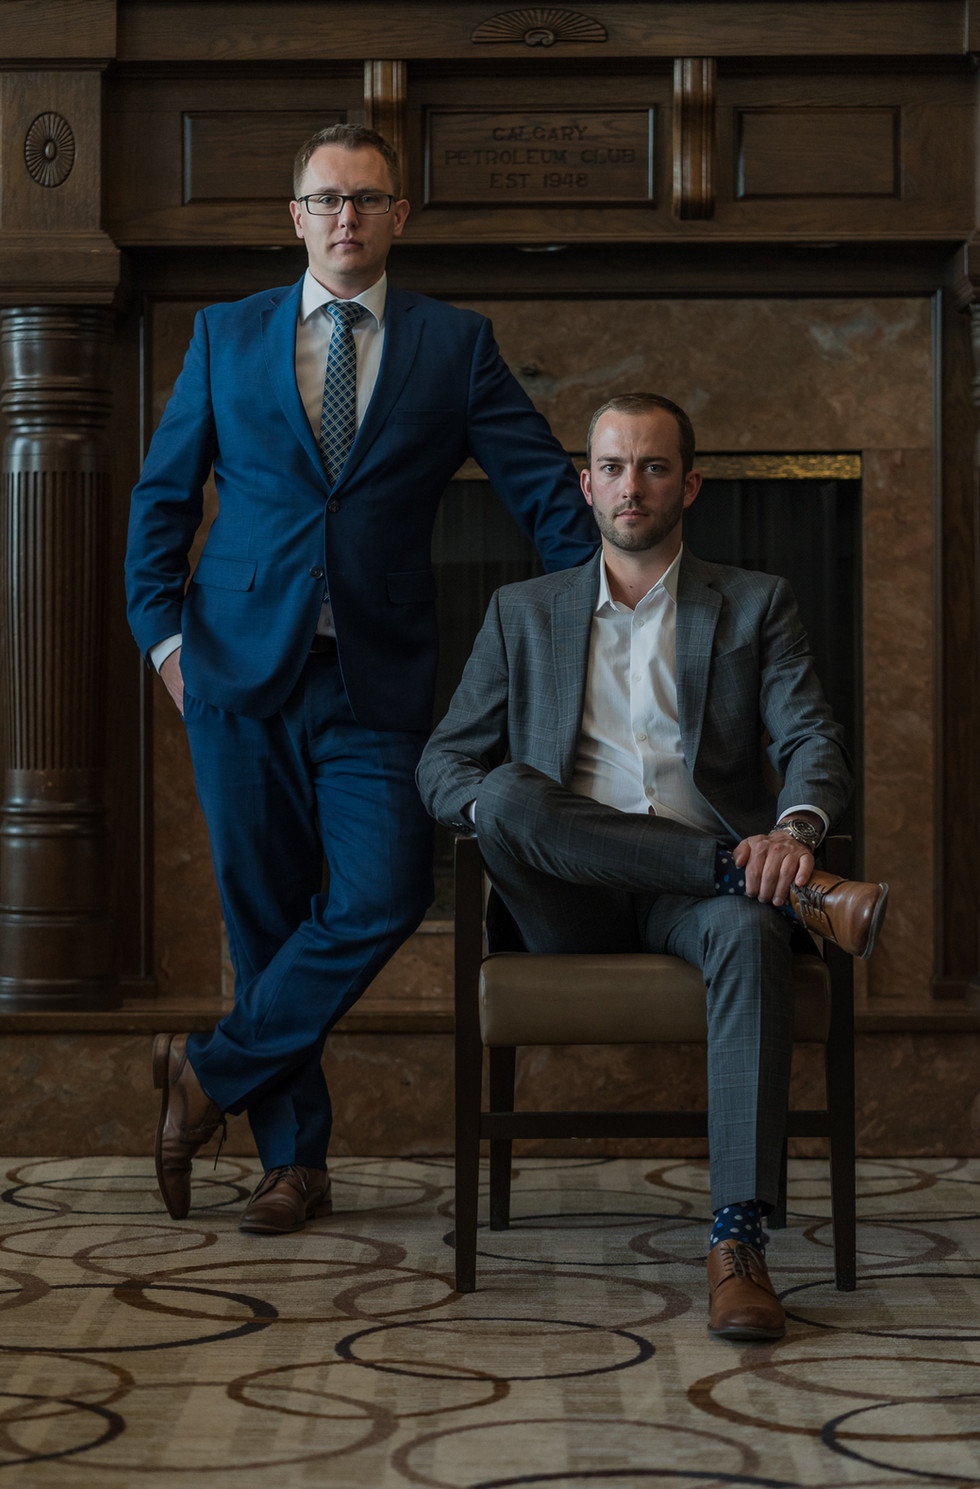 Corporate Business Headshot. Konstantin Kuligin and Mike Sheret